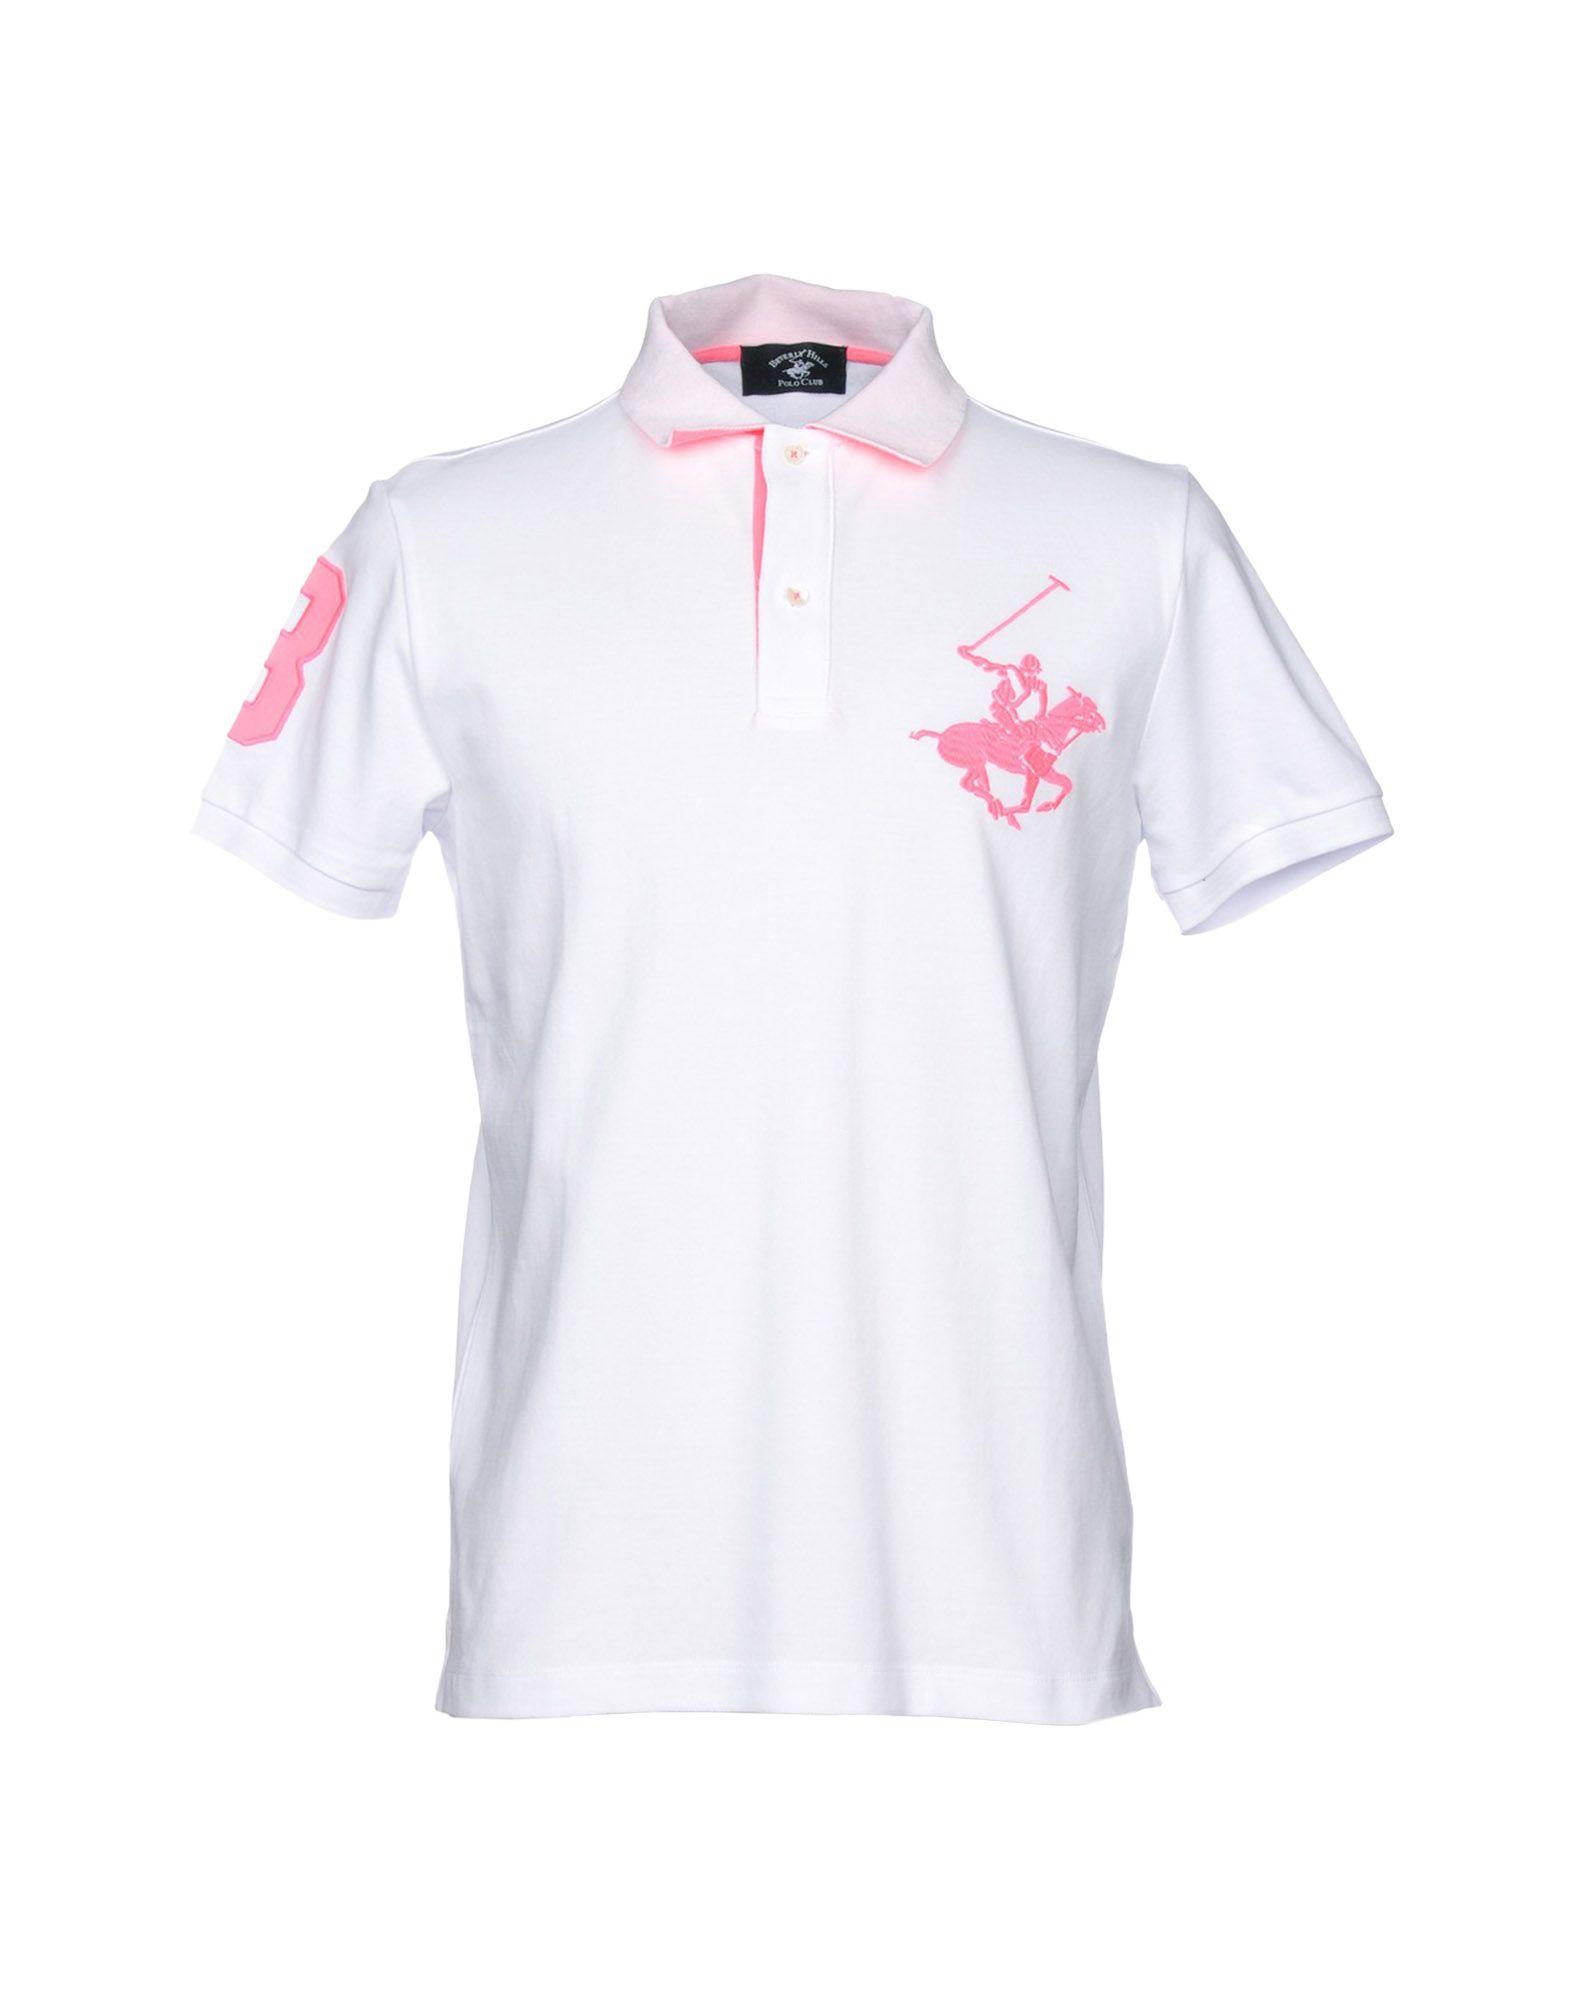 BEVERLY HILLS POLO CLUB Поло поло asics футболка поло m club polo